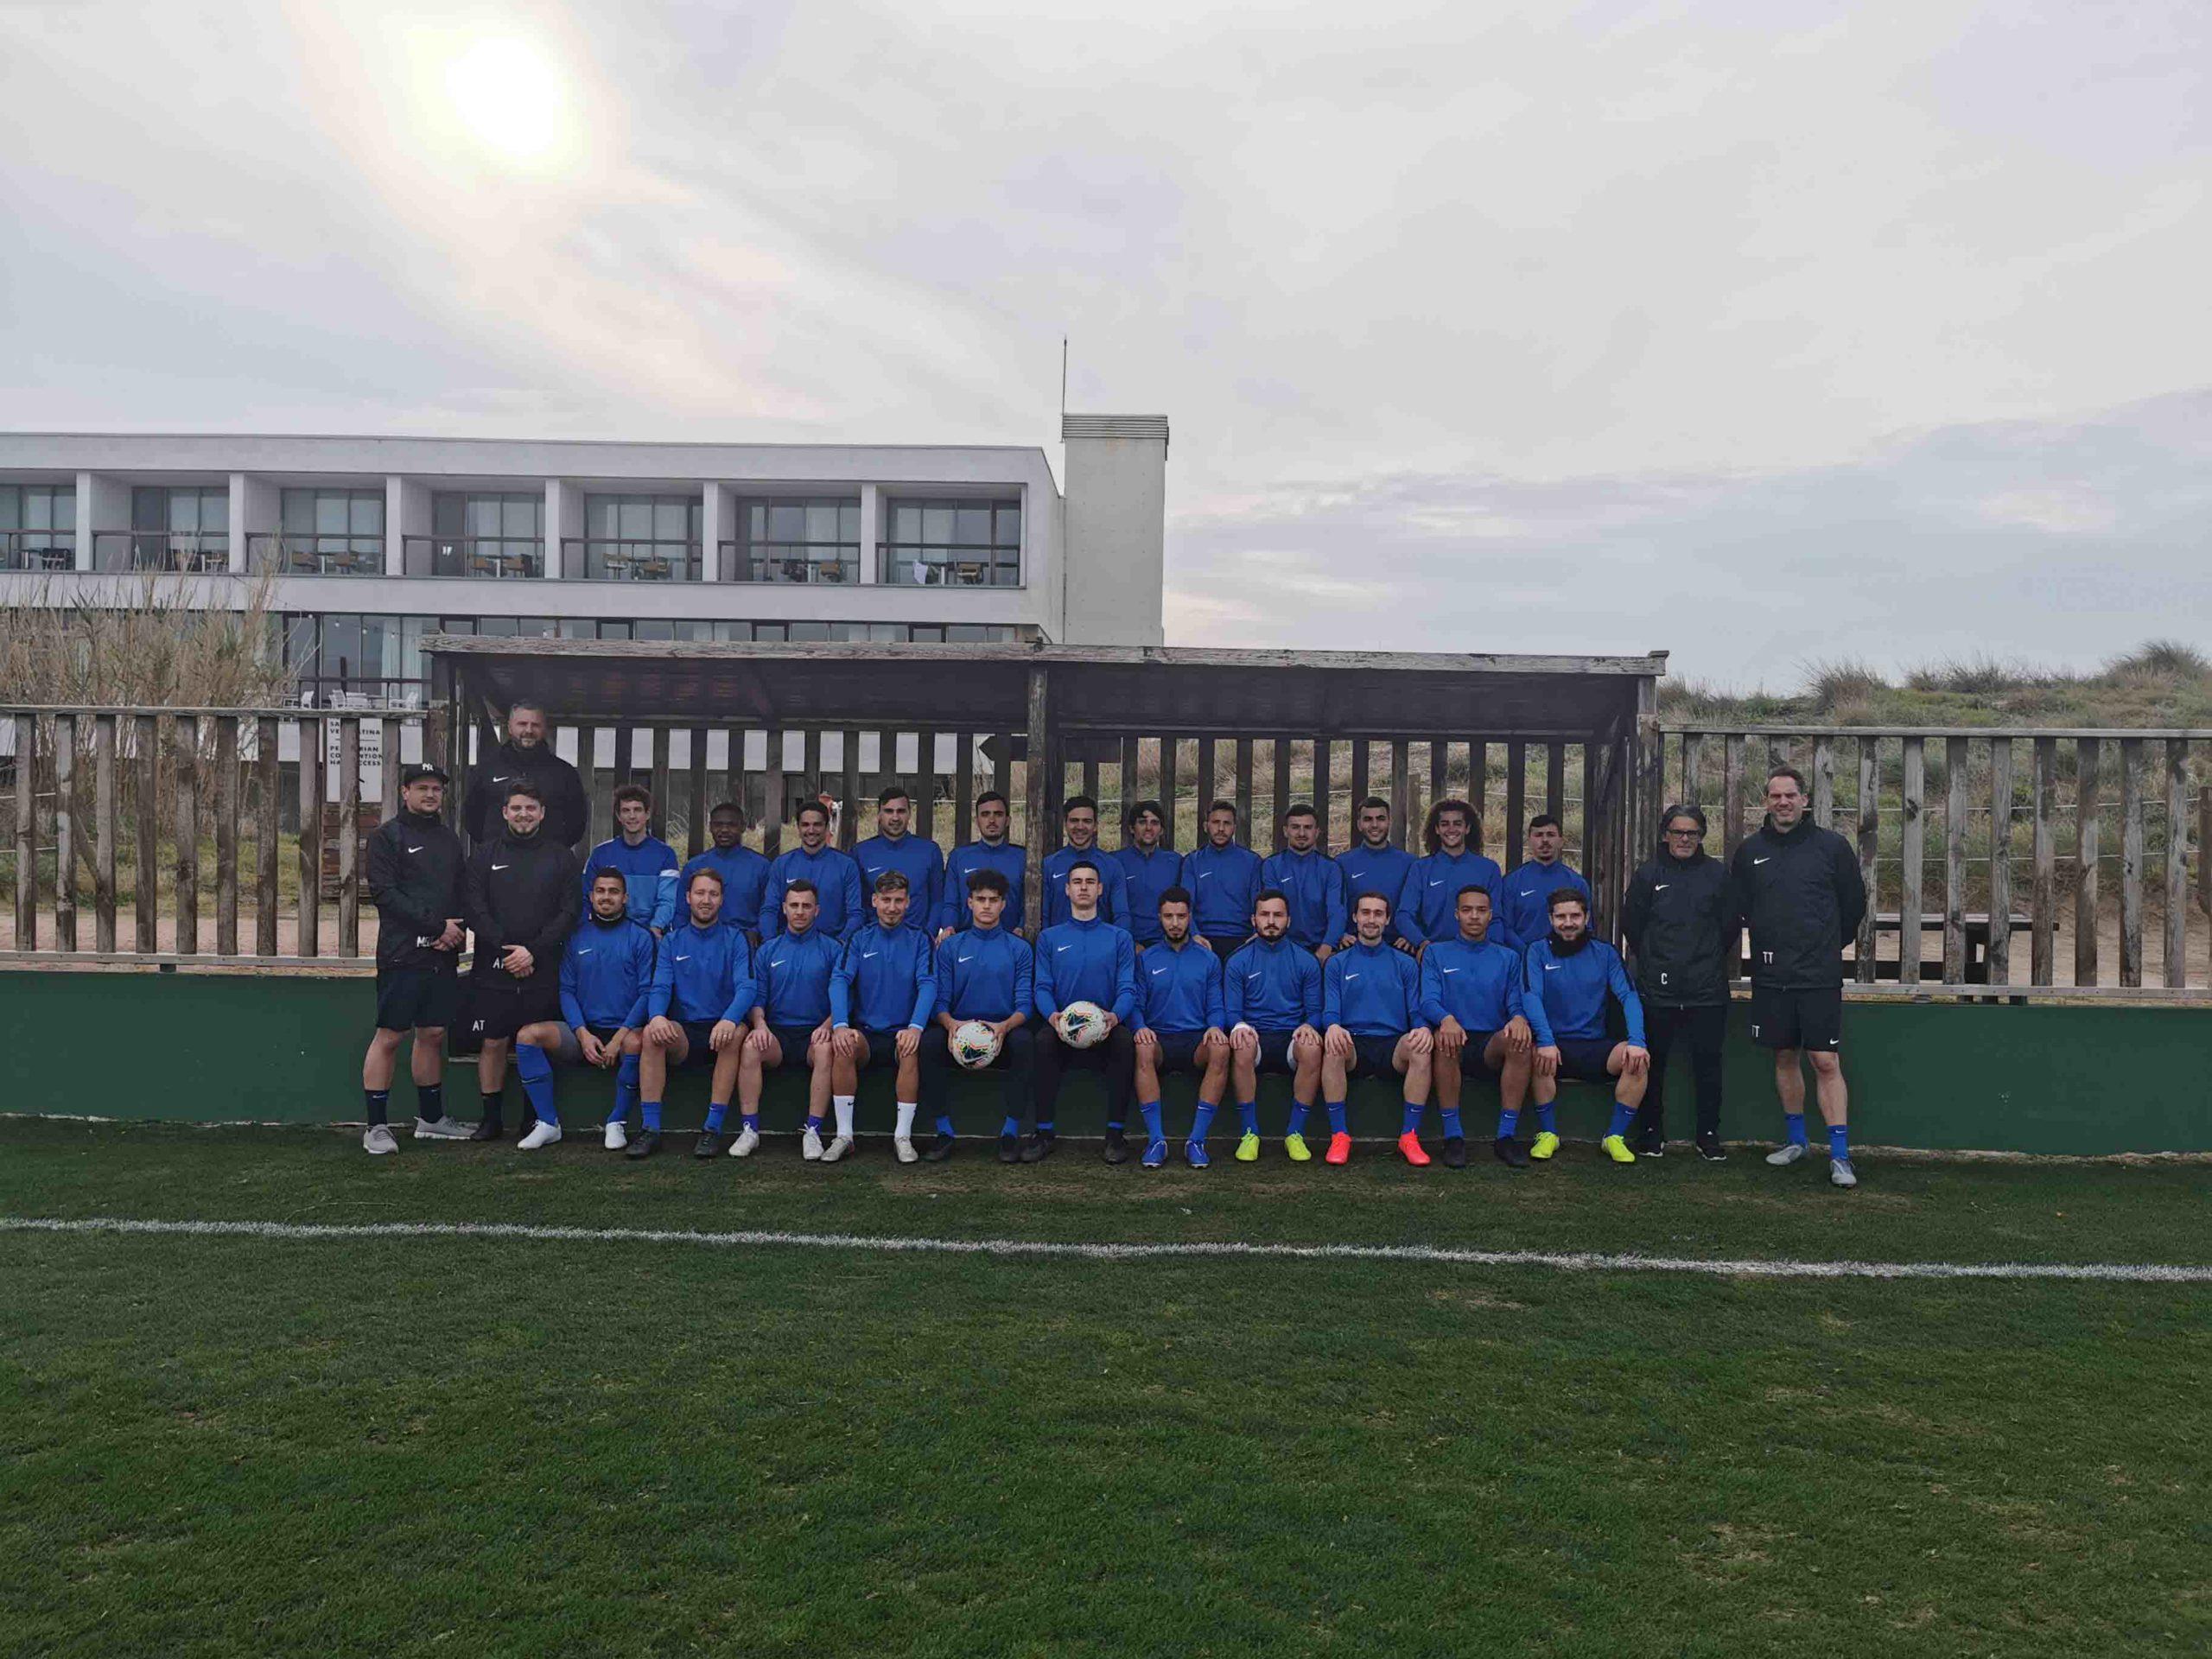 (Natur-)Rasenballsportgrüsse aus Valencia, 1. Mannschaft SV Höngg.